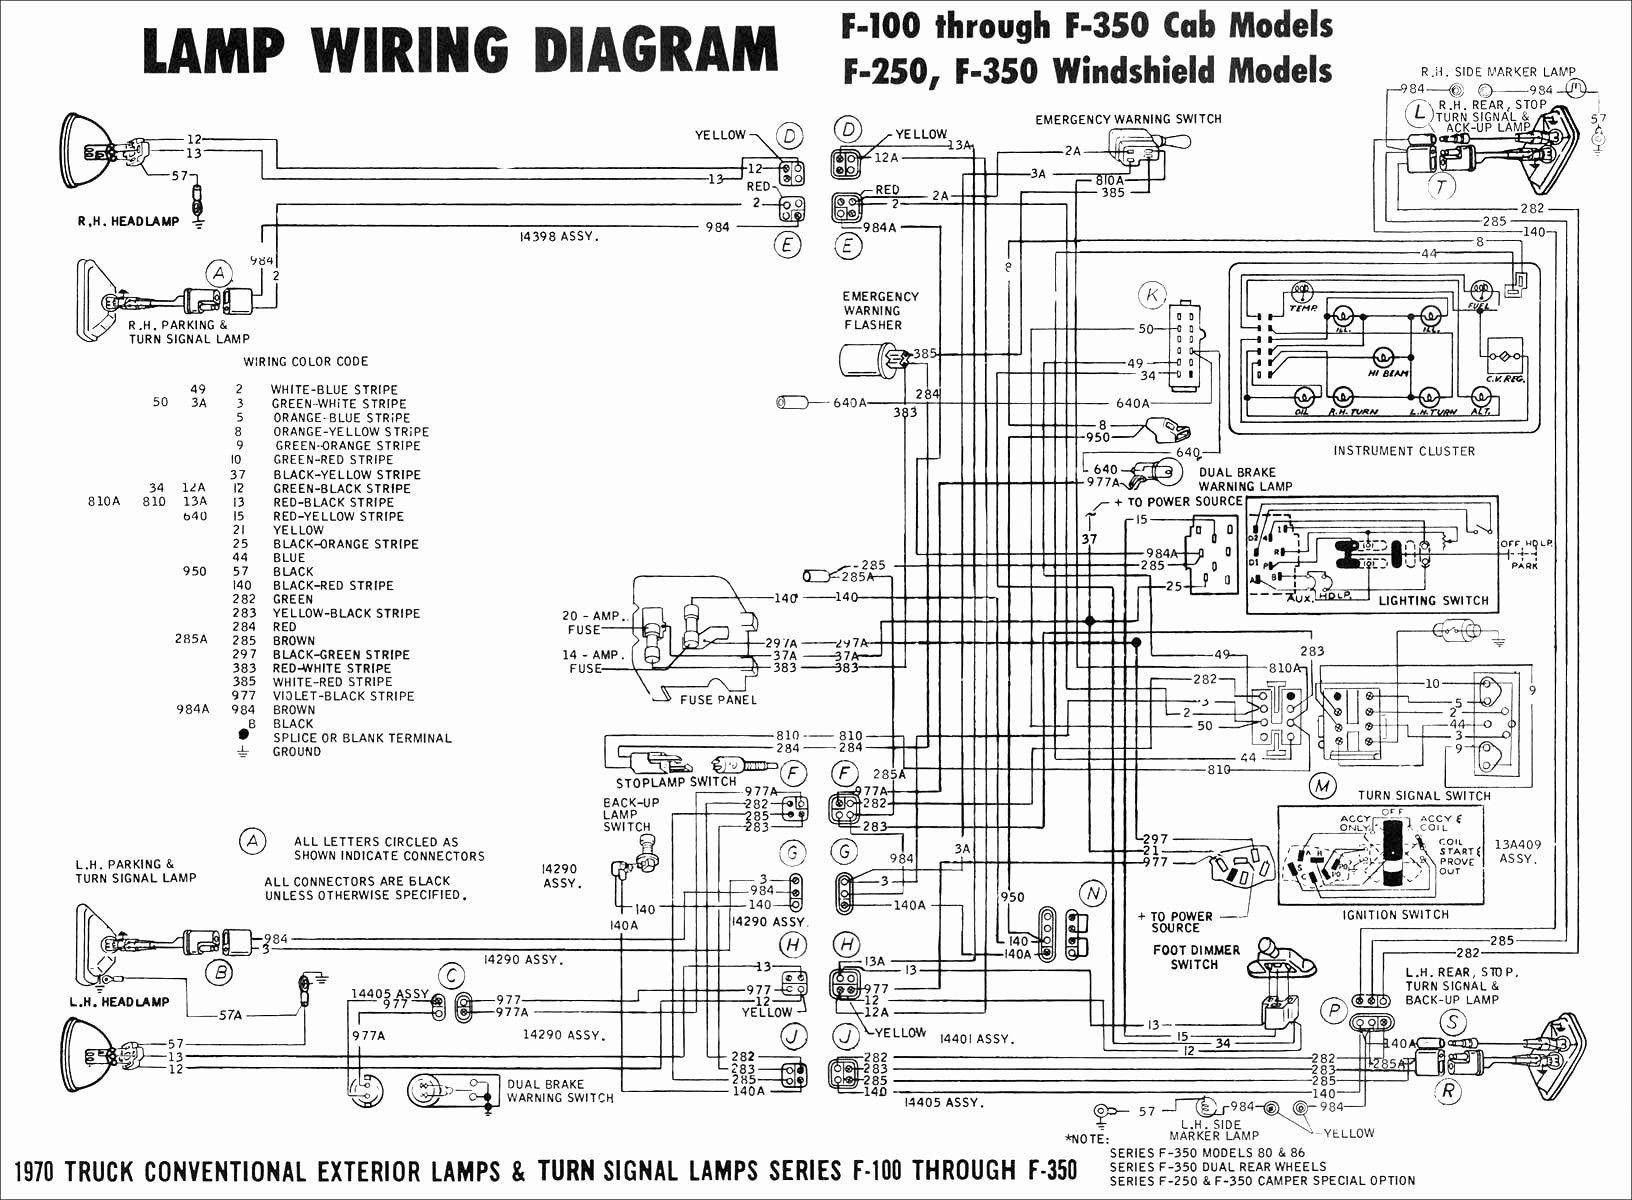 2004 Ford Freestar Engine Diagram In 2020 Trailer Wiring Diagram Electrical Wiring Diagram Circuit Diagram